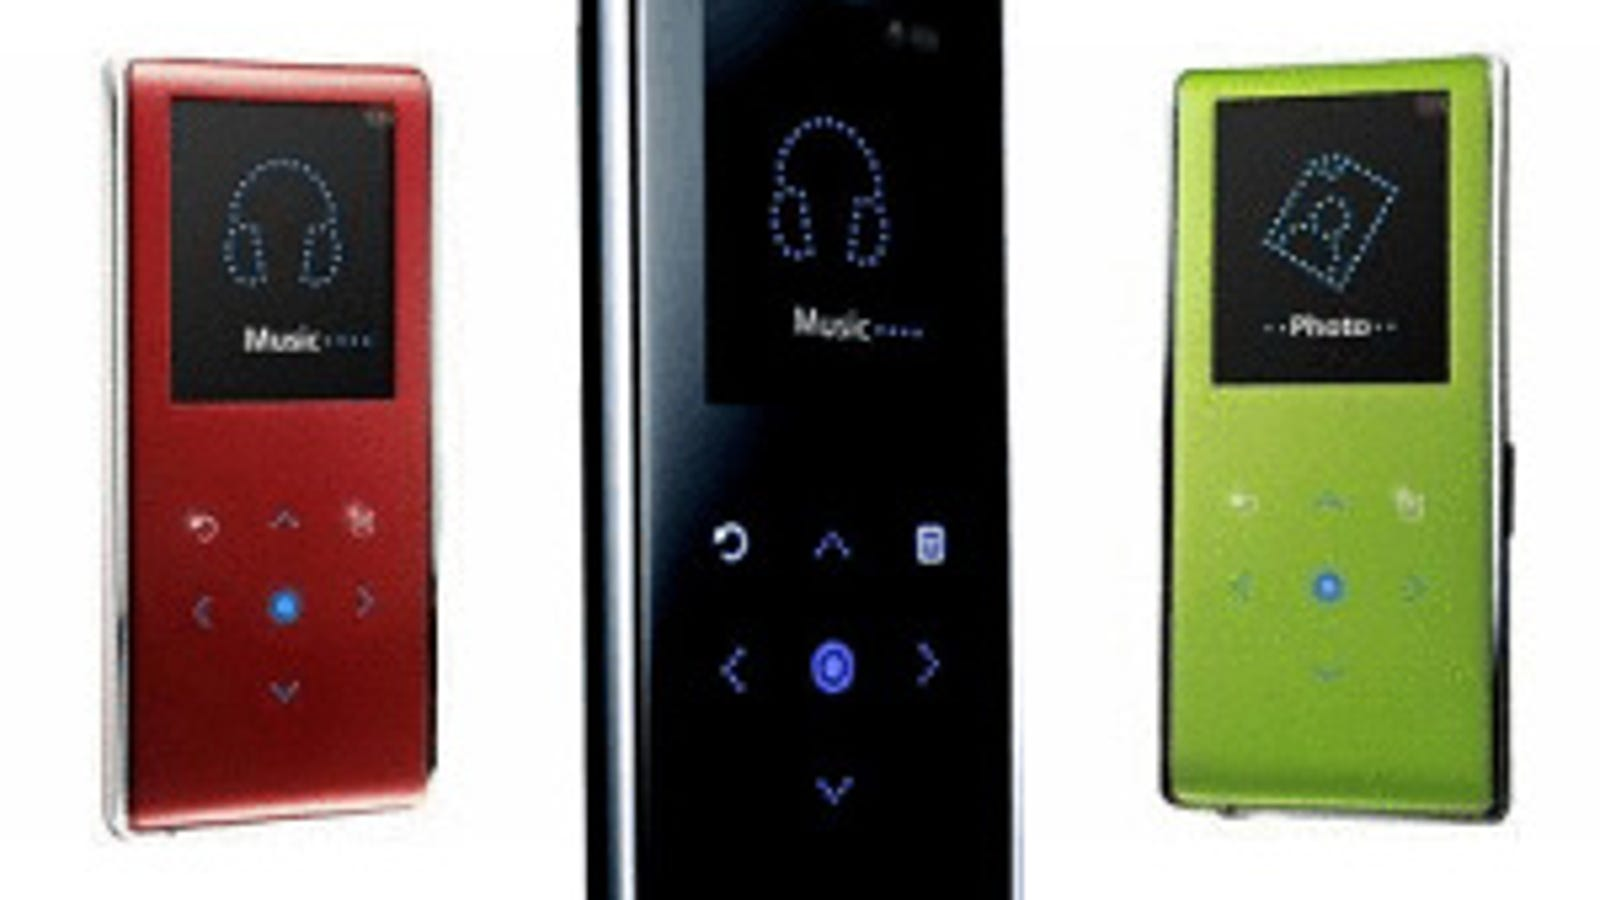 Samsung YP-K3 Reviewed, Almost Here [verdict: still not an iPod nano killer]